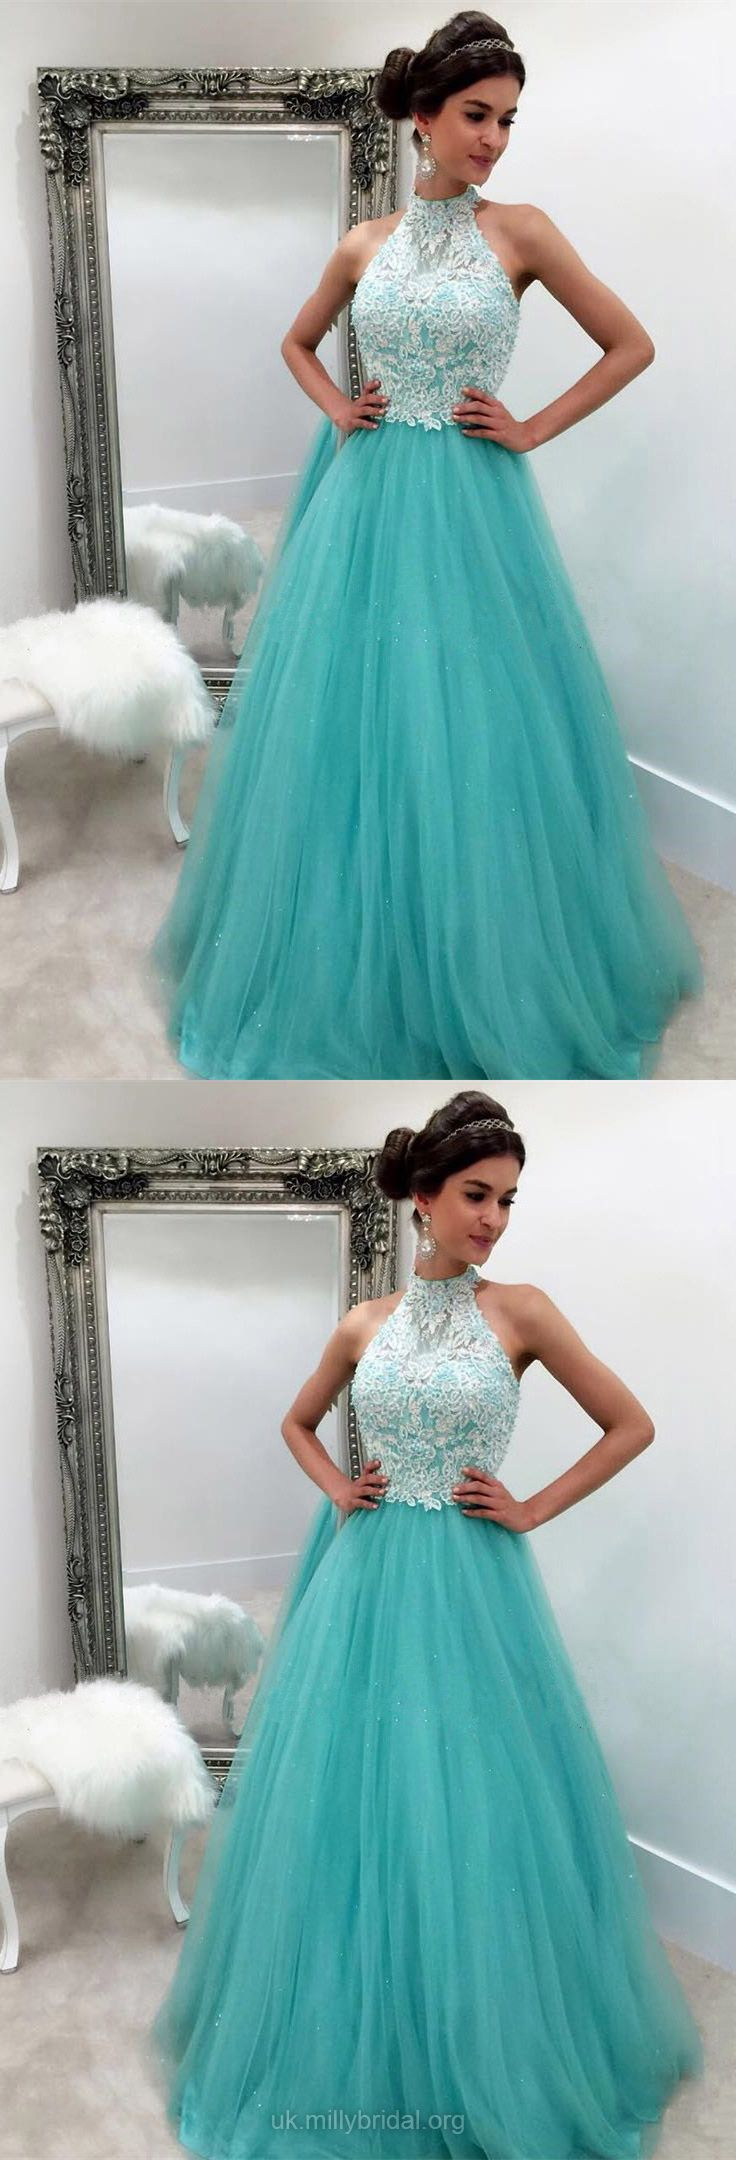 1511 best Chiffon dress images on Pinterest | Prom dresses, Prom ...